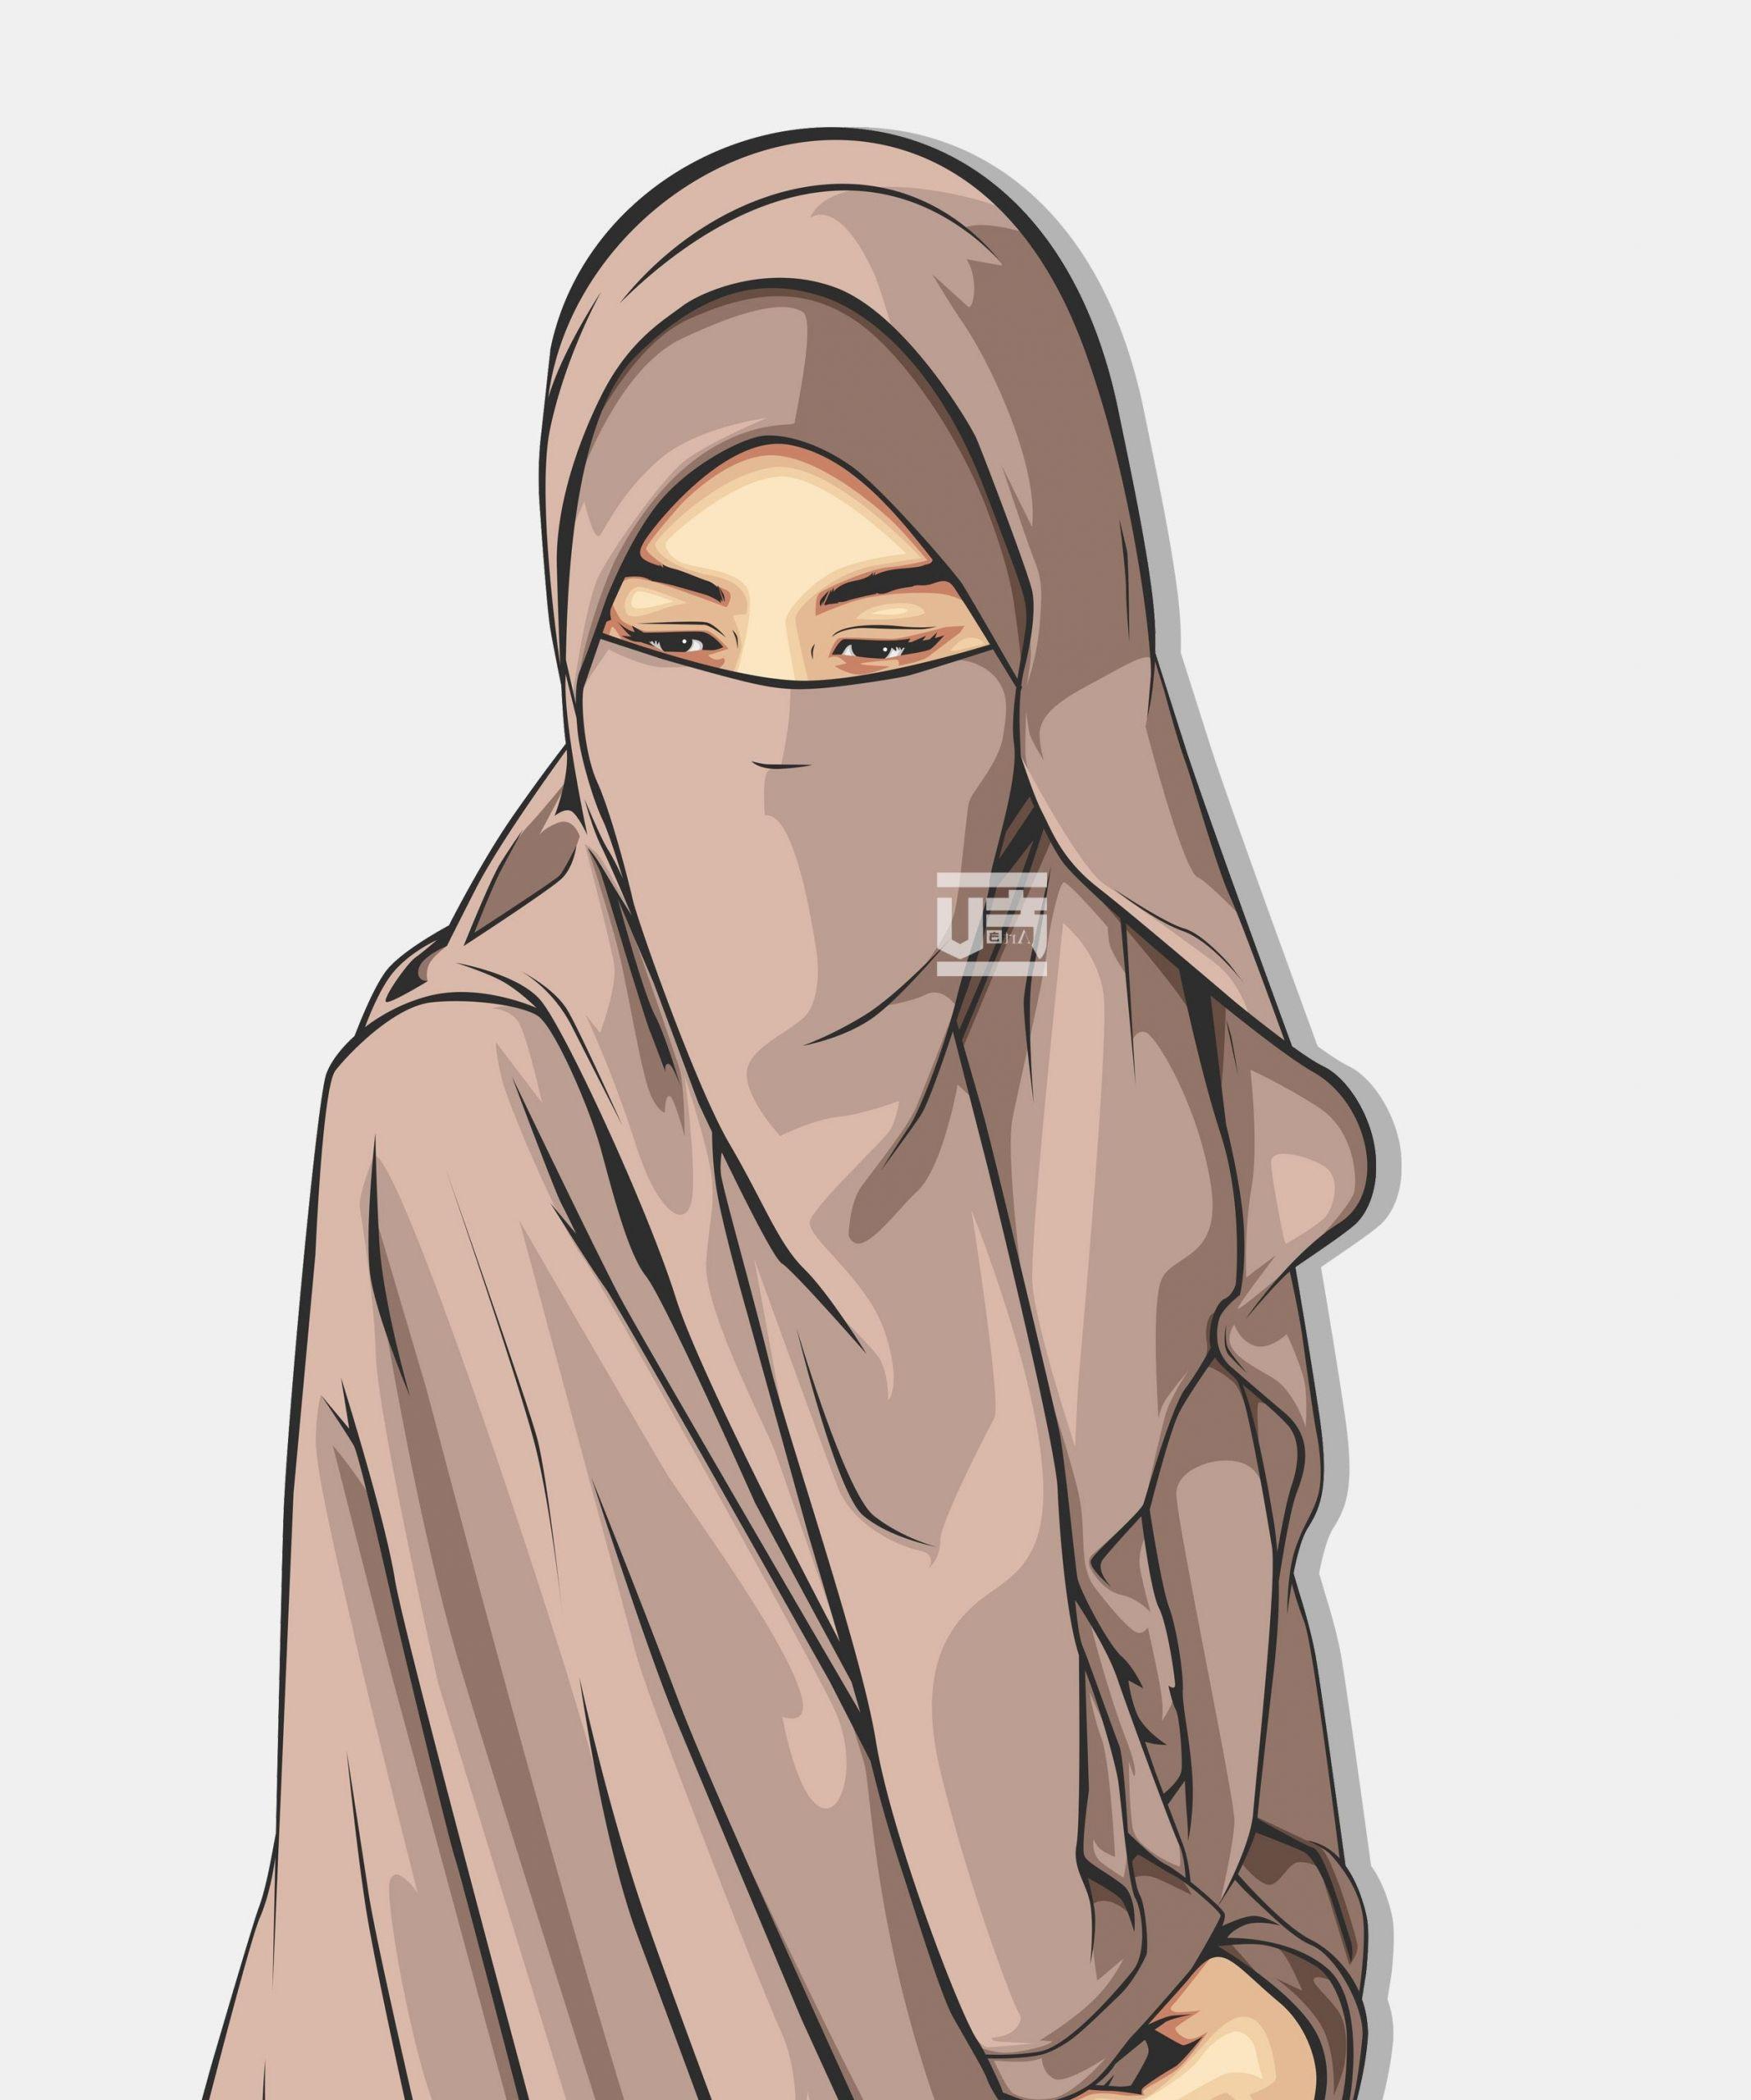 Design Muslimah Bercadar Kartun Drdp top Gambar Kartun Muslimah Pakai Niqab